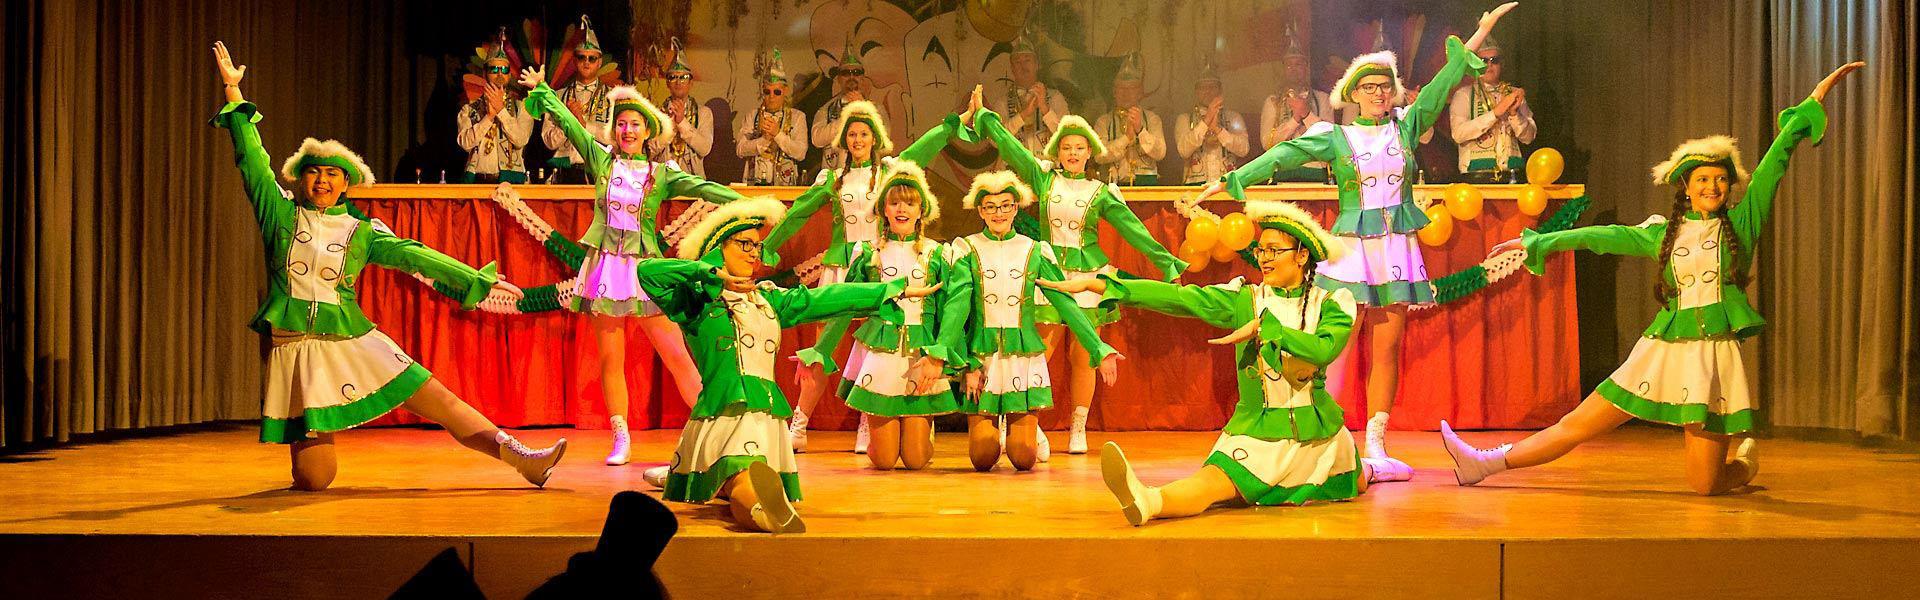 Grün-Weiß-Ballett